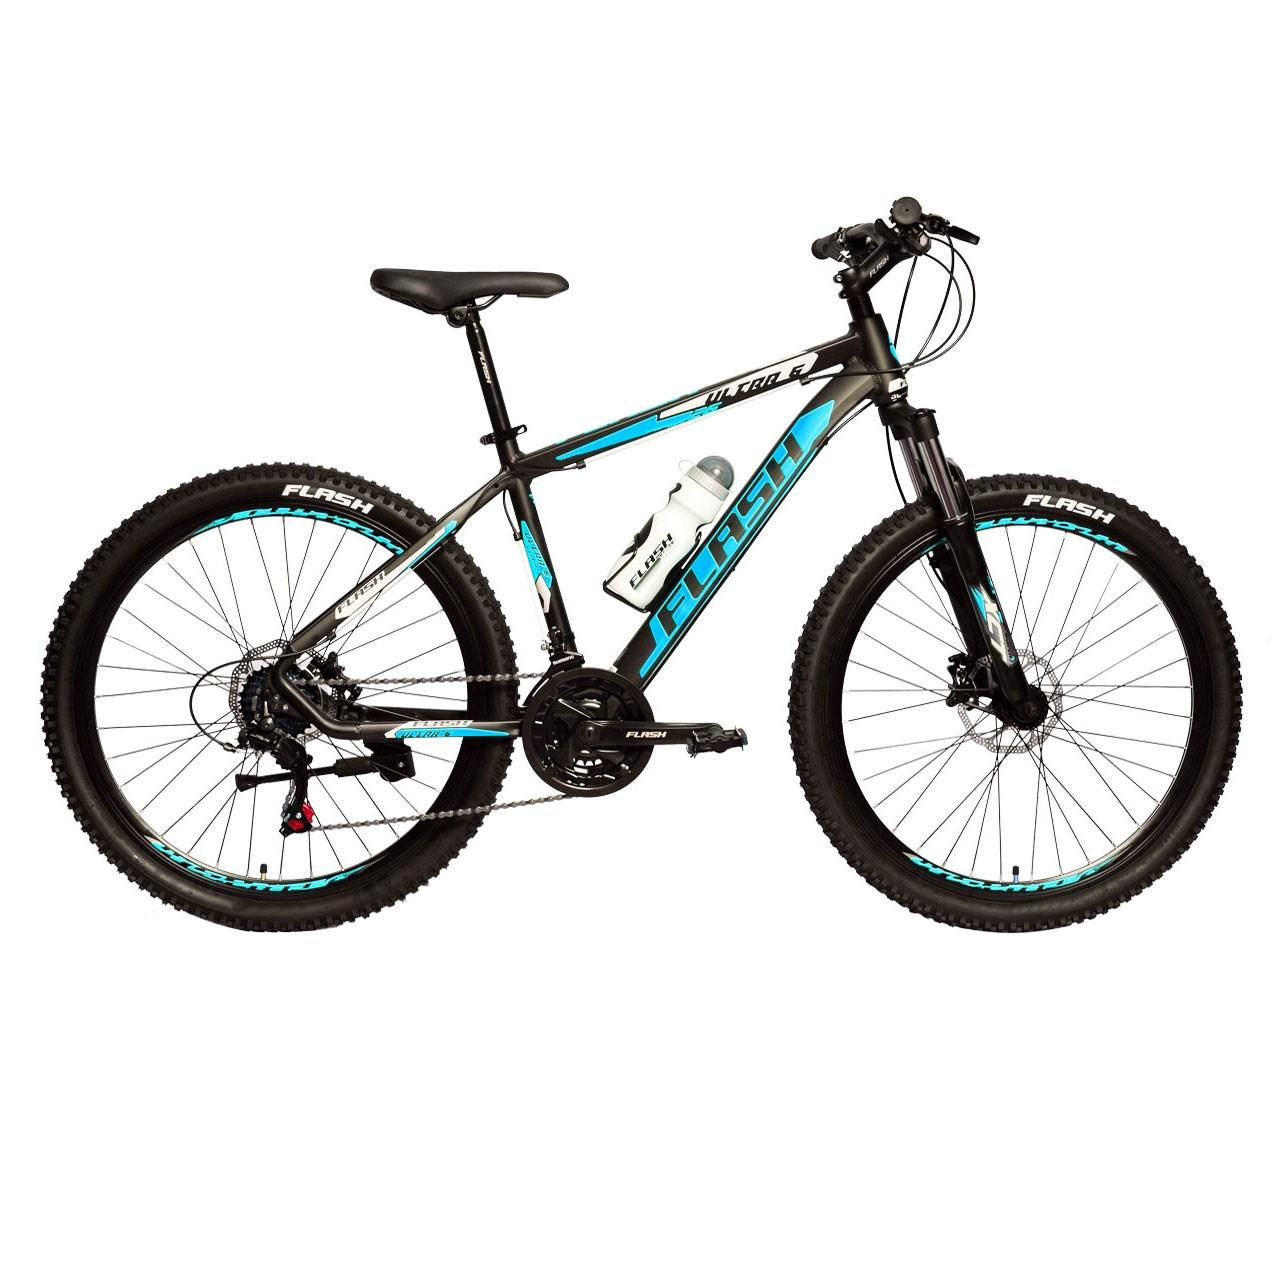 دوچرخه کوهستان فلش مدل ULTRA6 HYD سایز 26